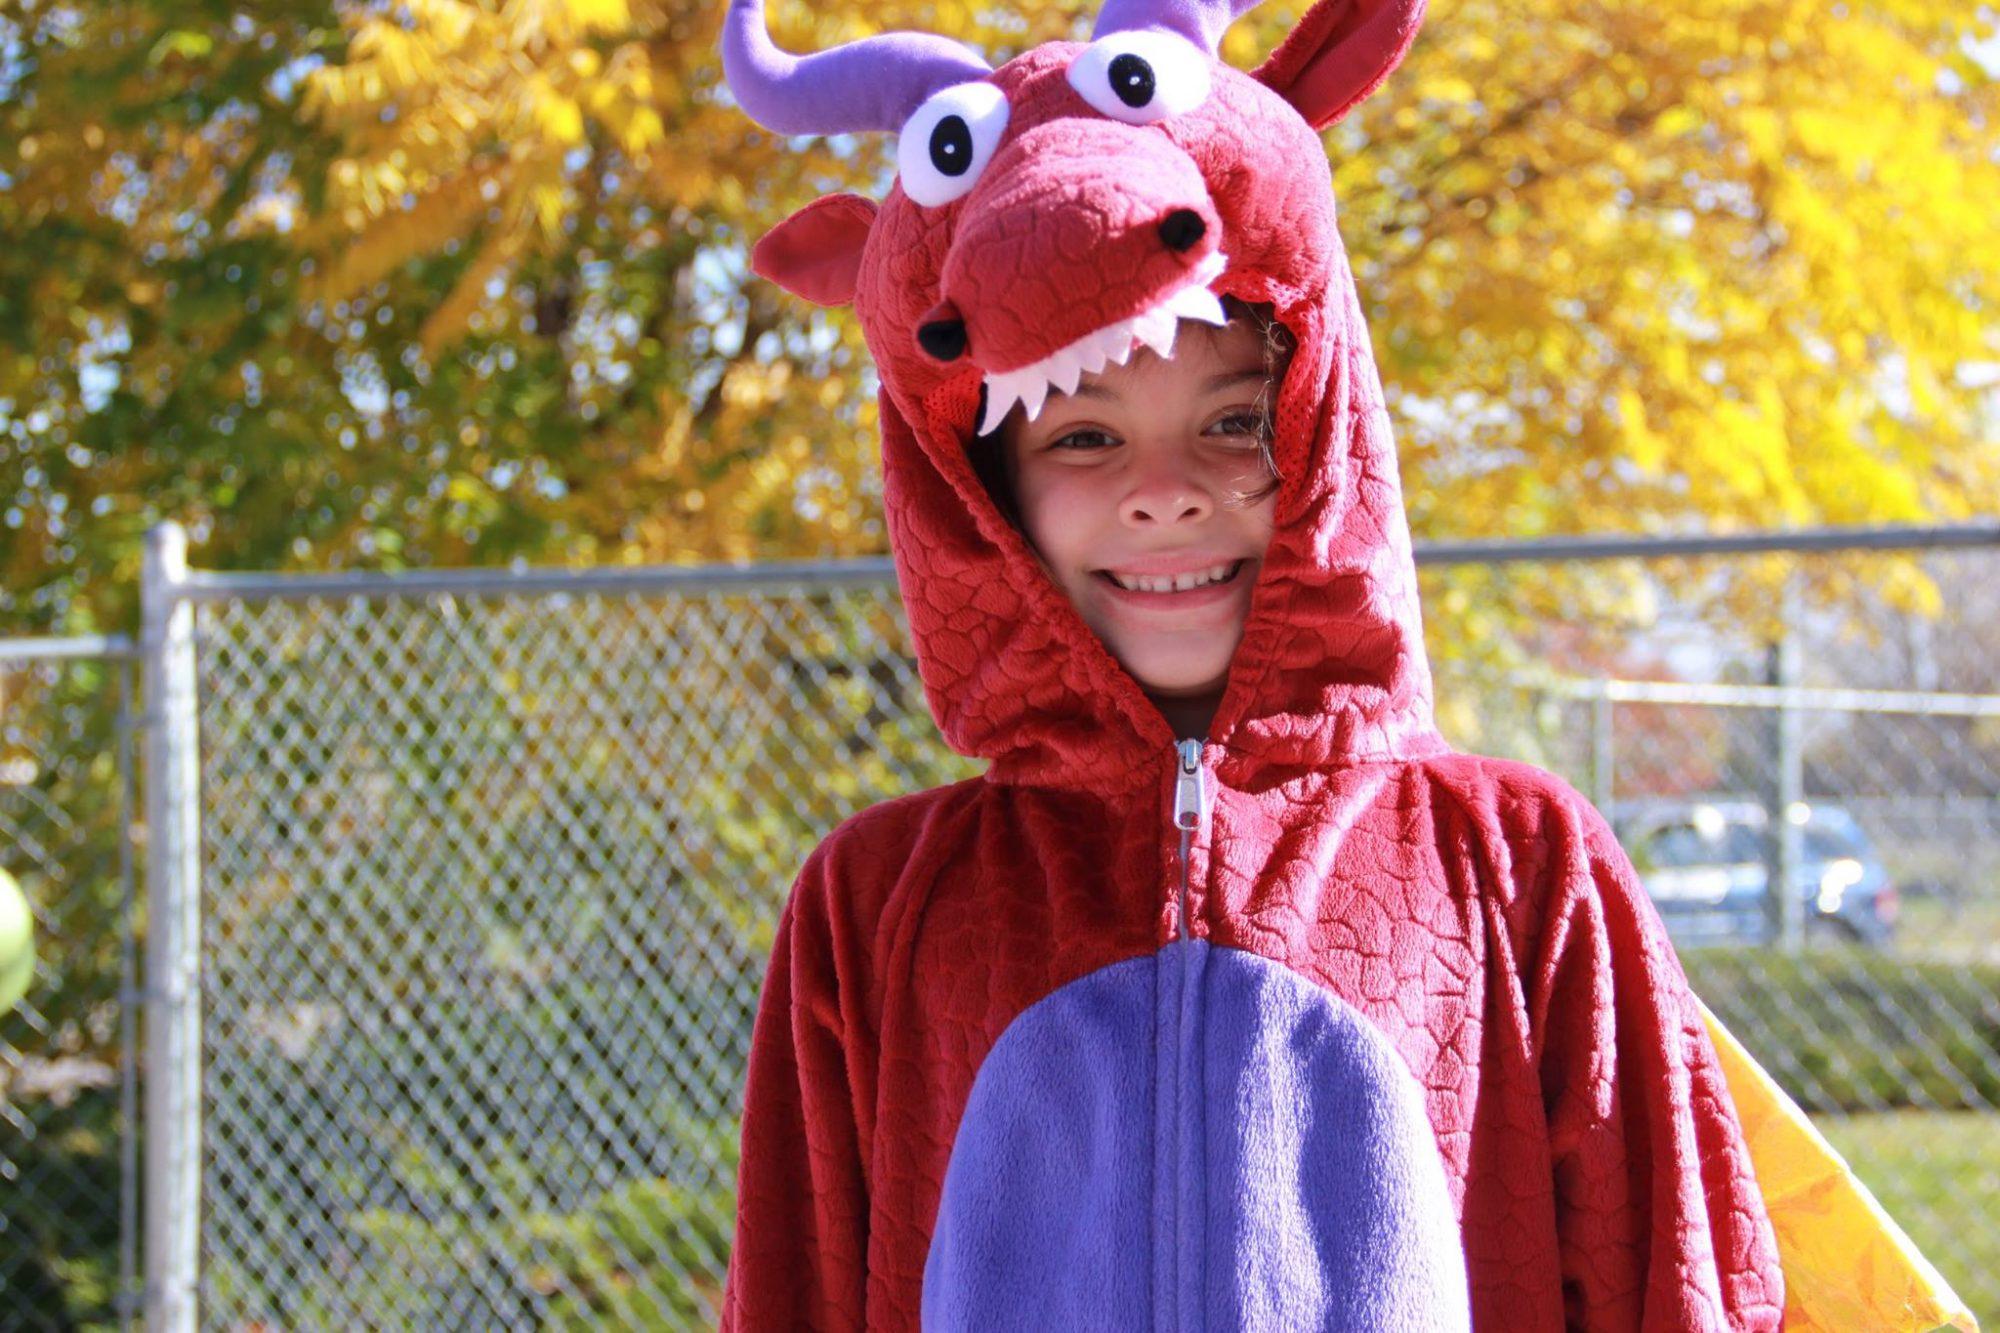 Boy in dragon costume